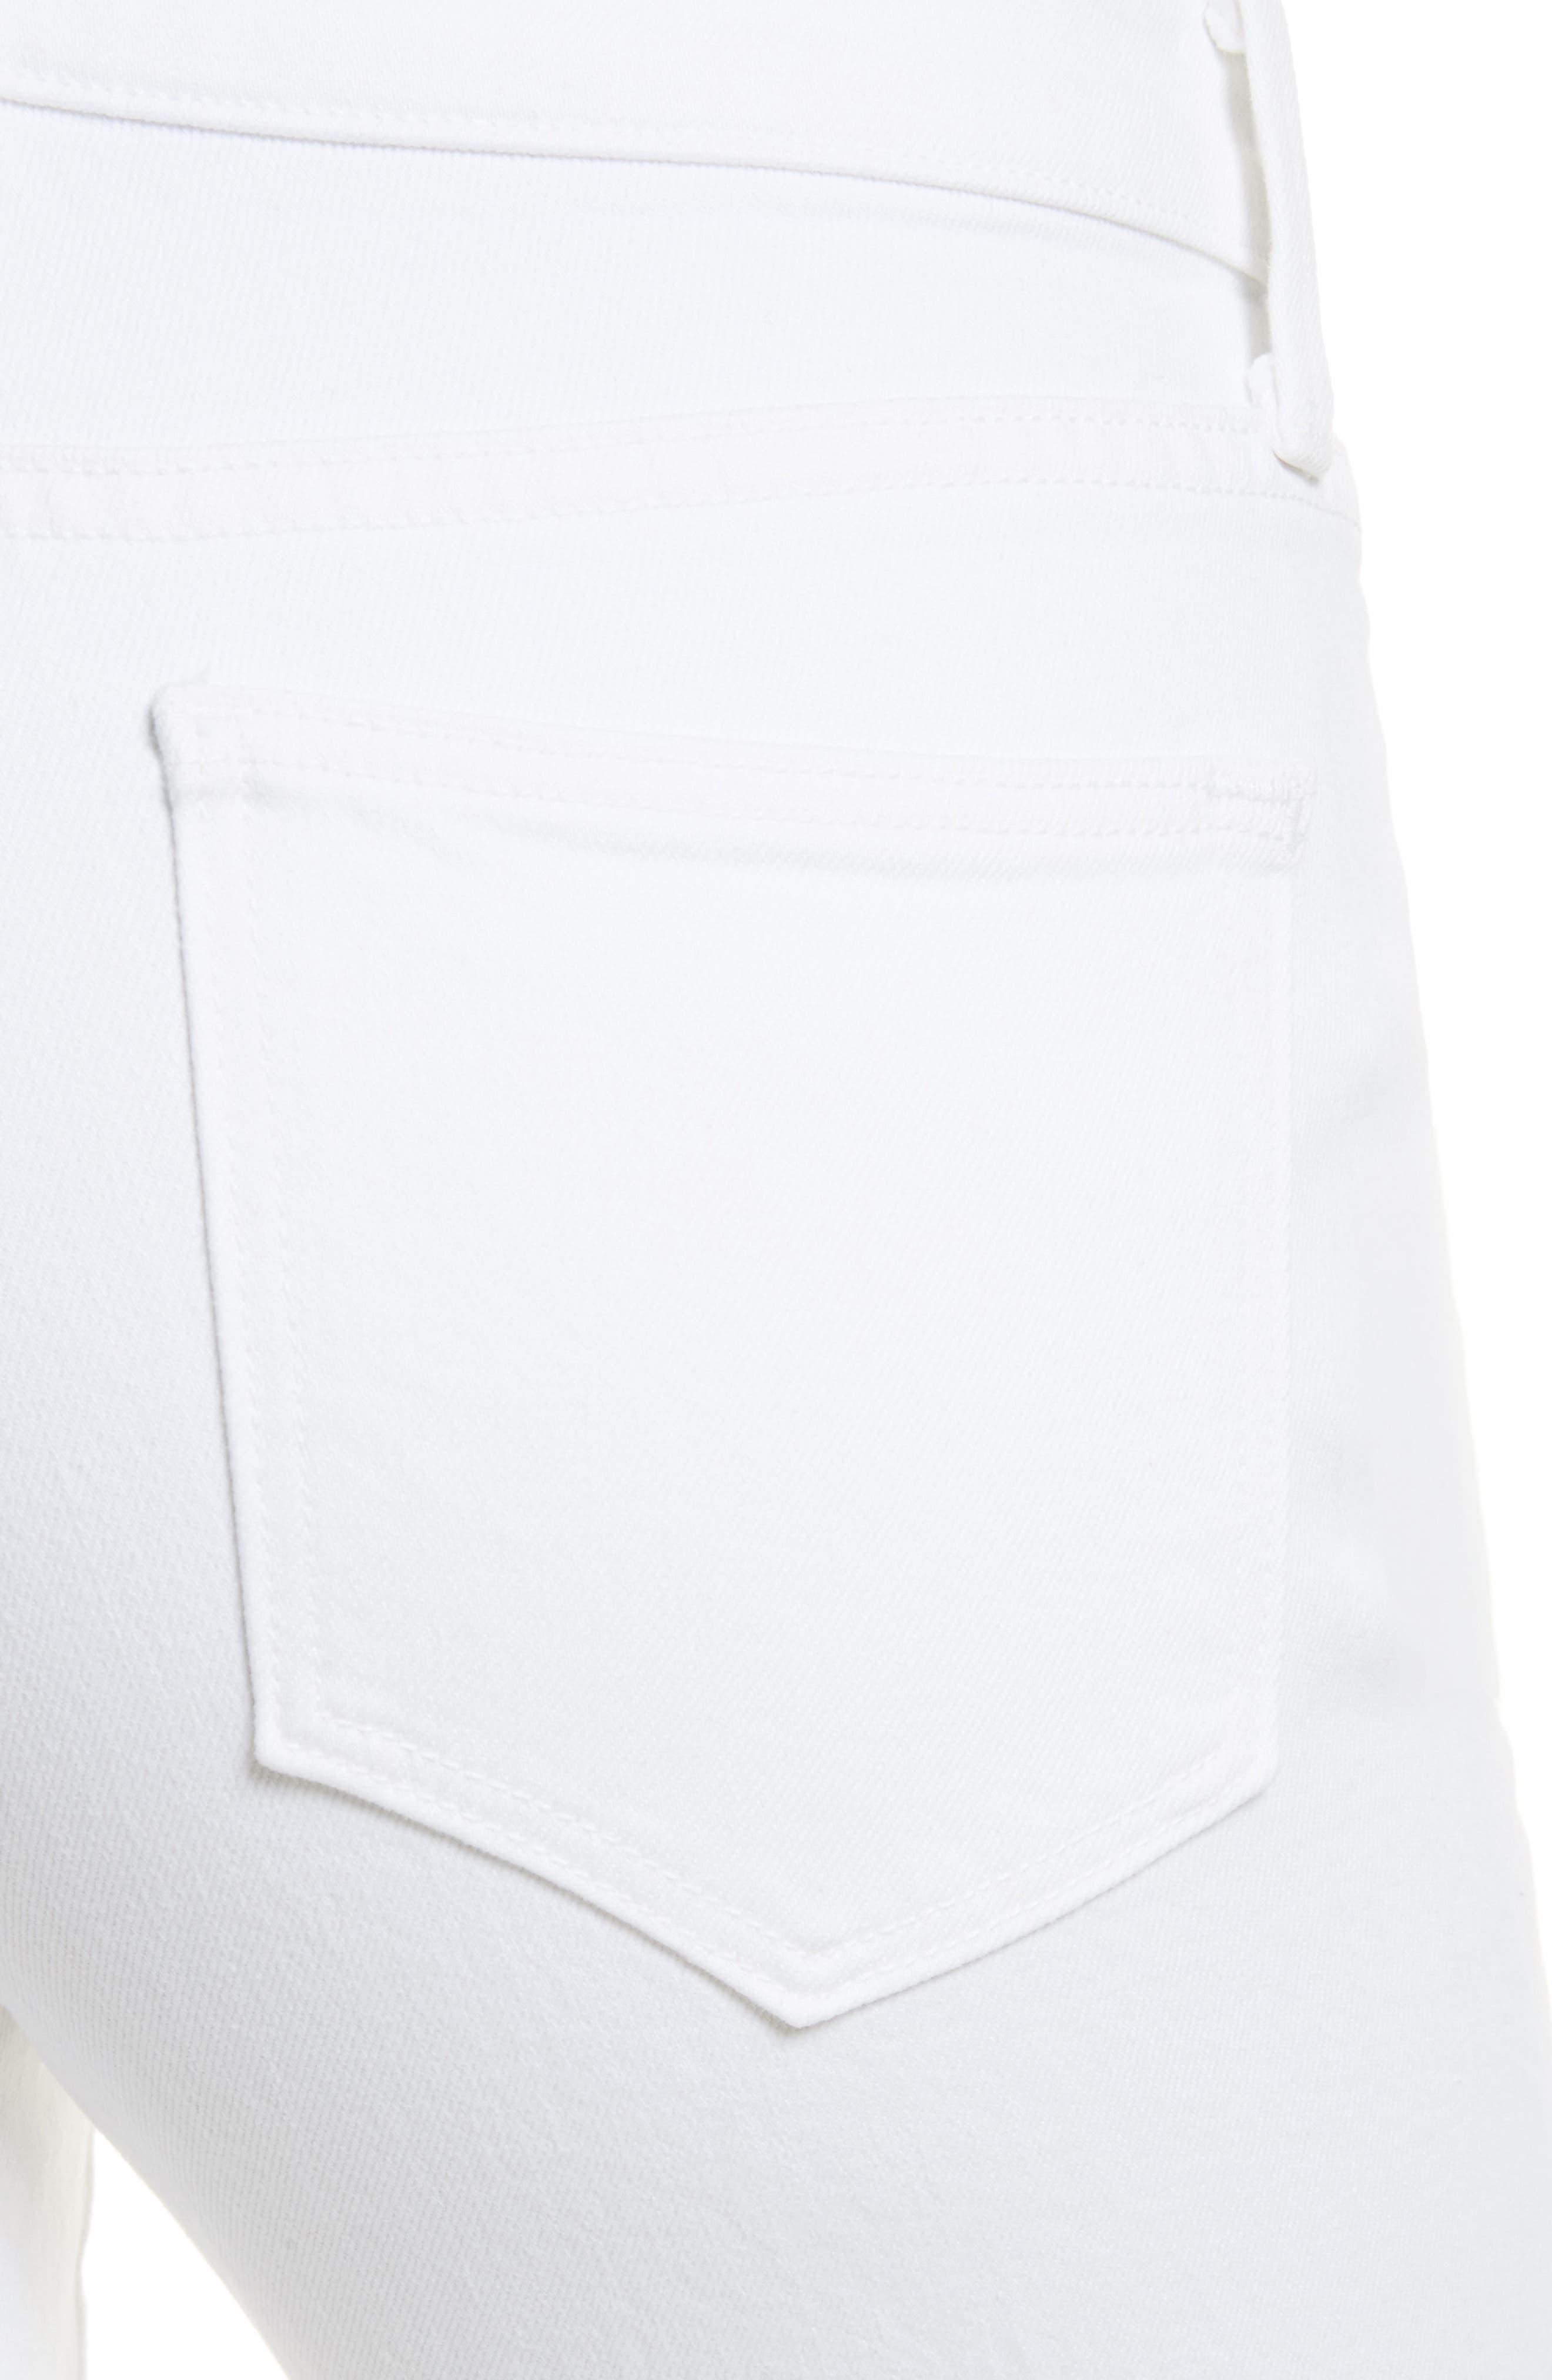 Skinny Crop Jeans,                             Alternate thumbnail 15, color,